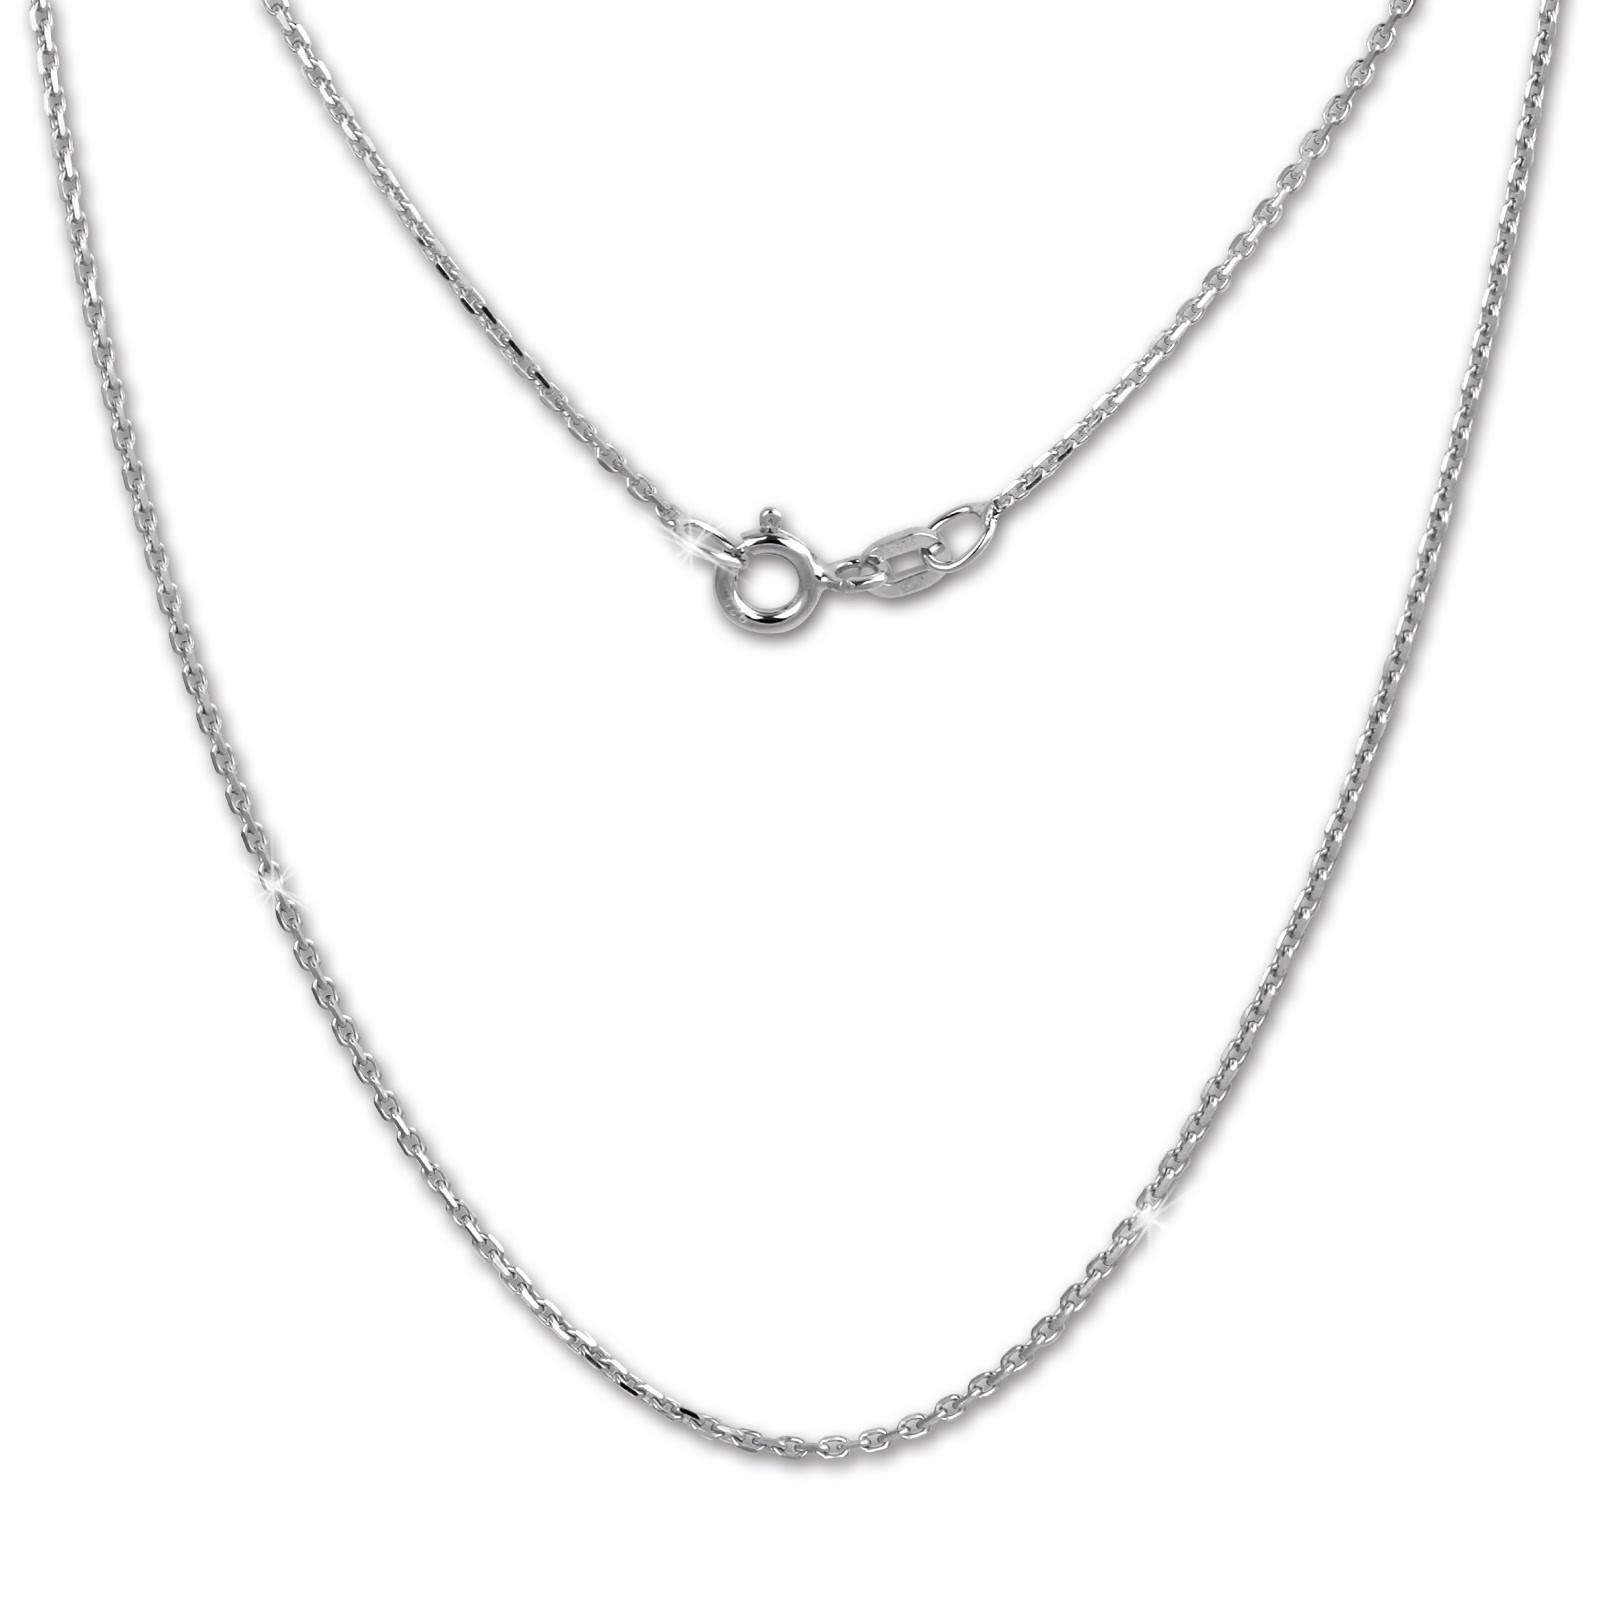 SilberDream Kette Anker diamantiert 925er Silber 45cm Damen Halskette SDK28945J